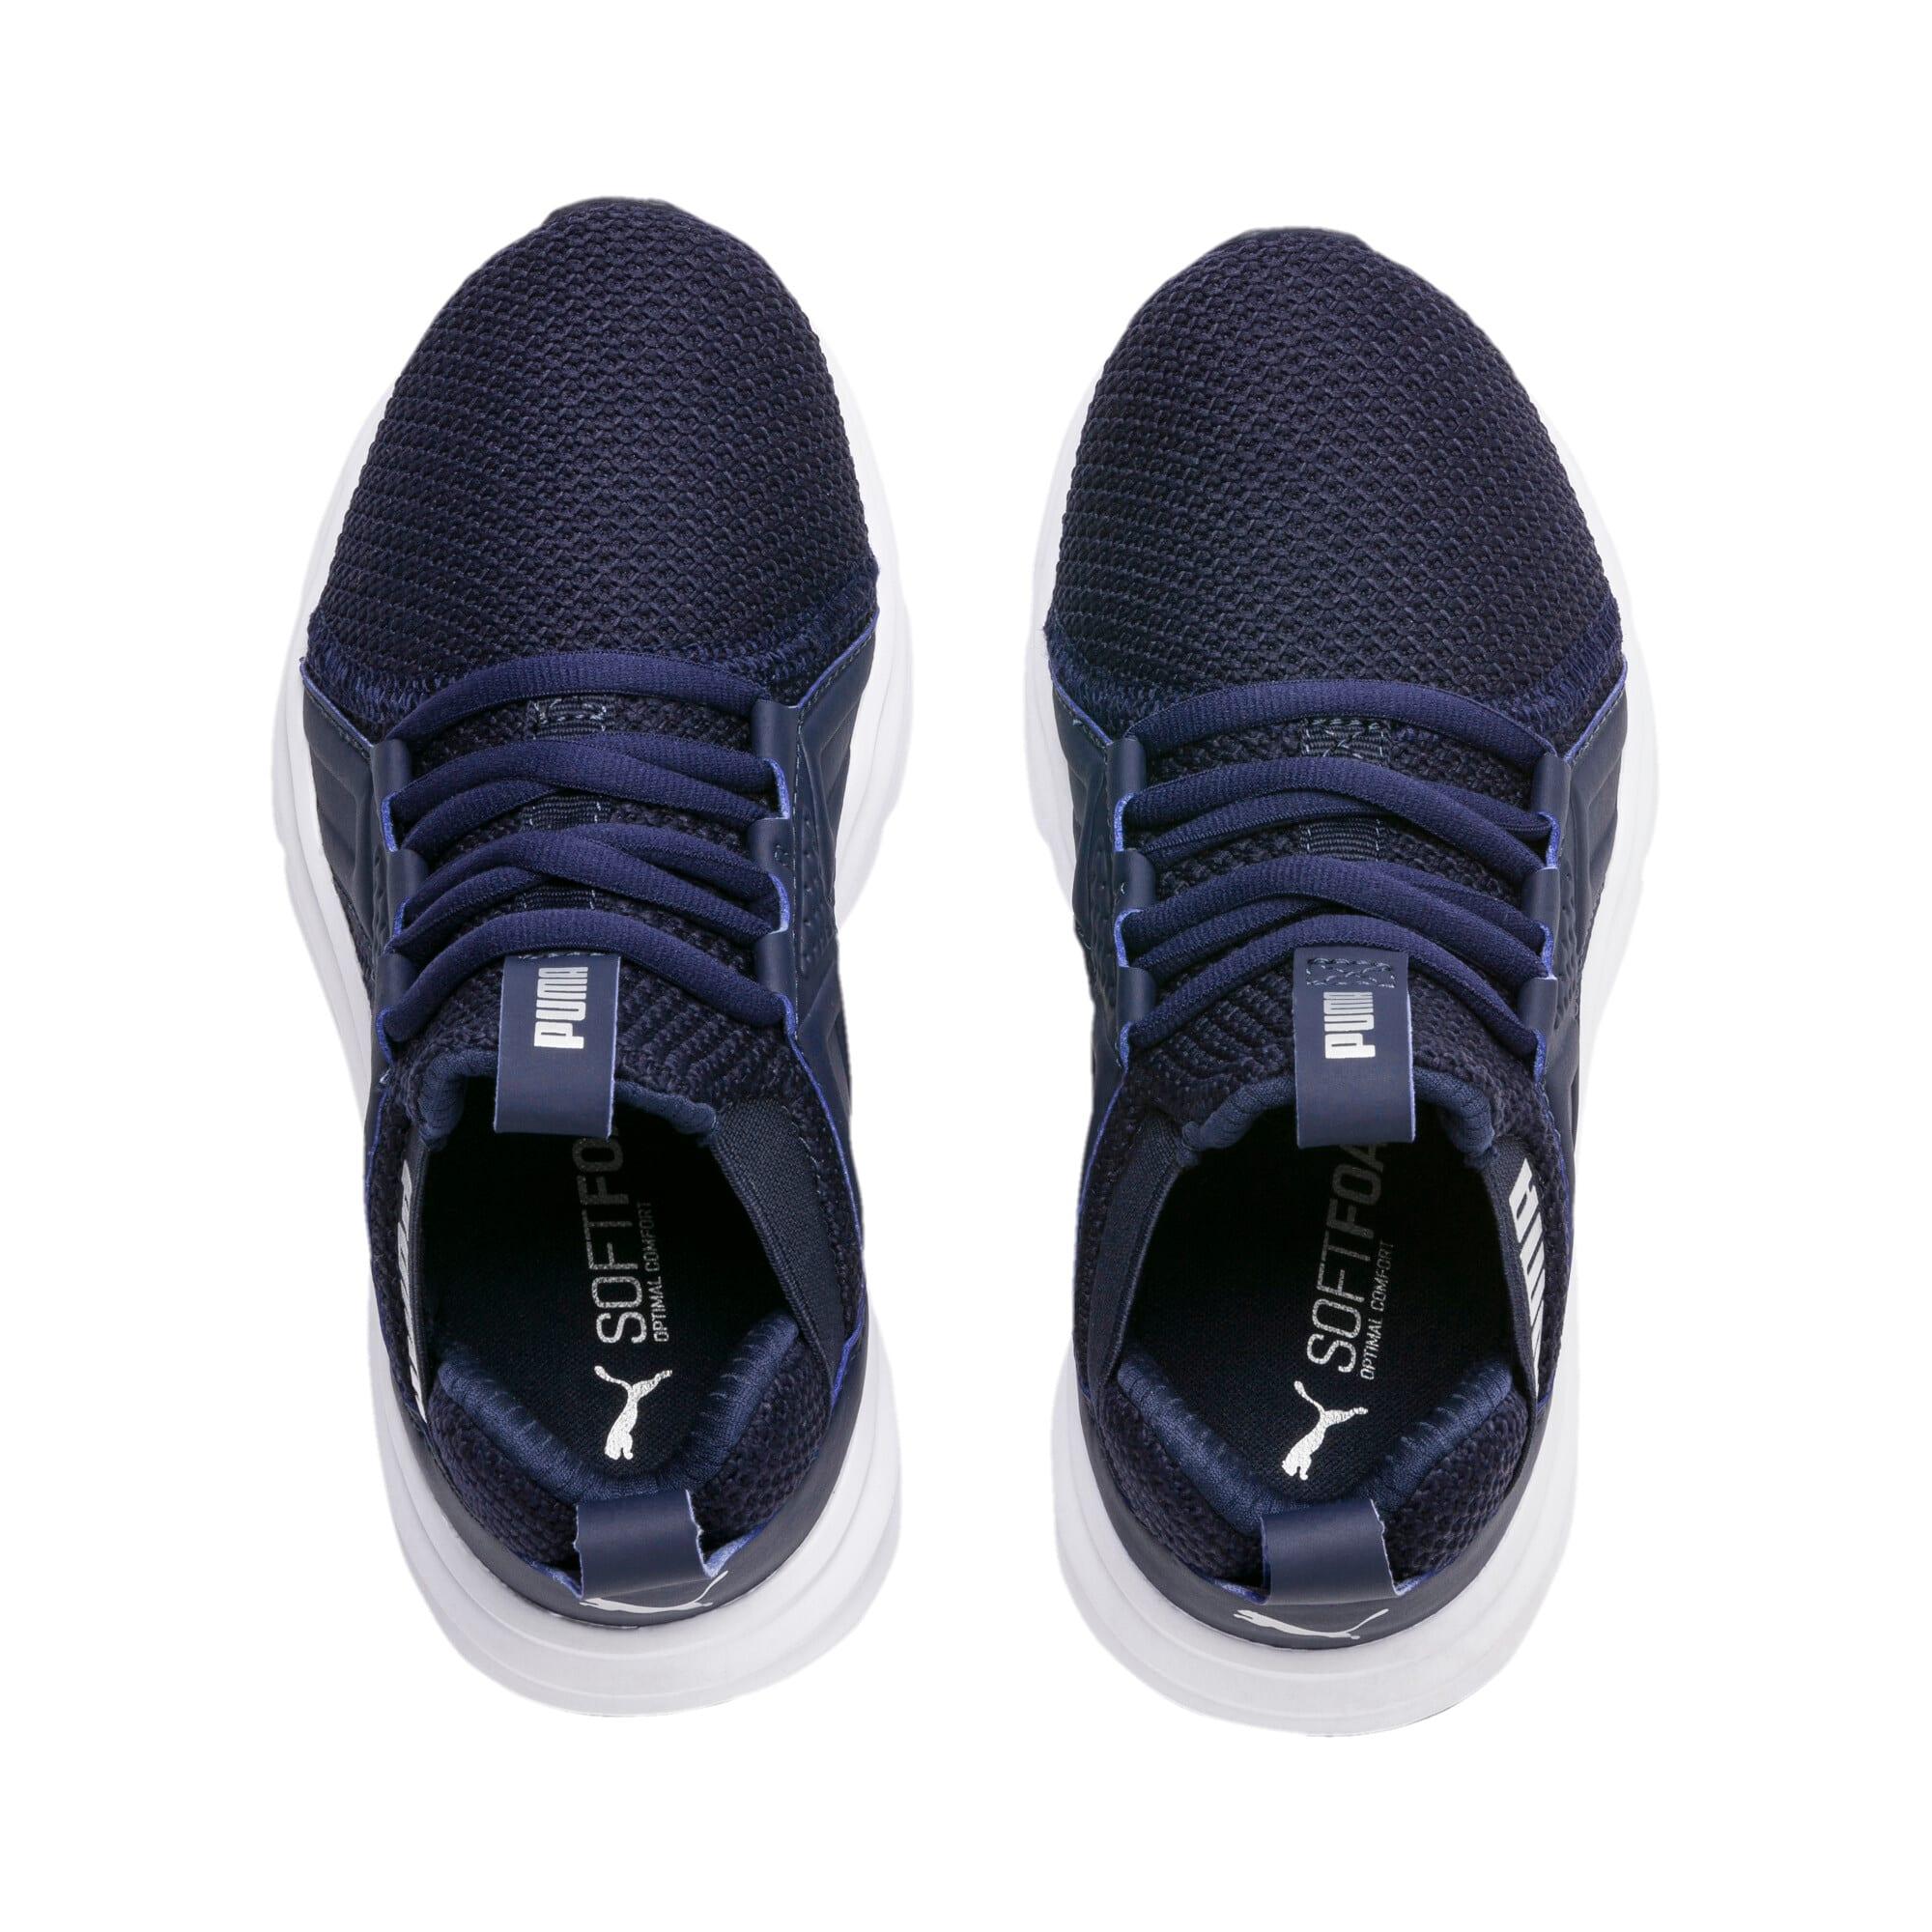 Thumbnail 6 of Enzo Weave AC Sneakers PS, Peacoat - Silver-Puma White, medium